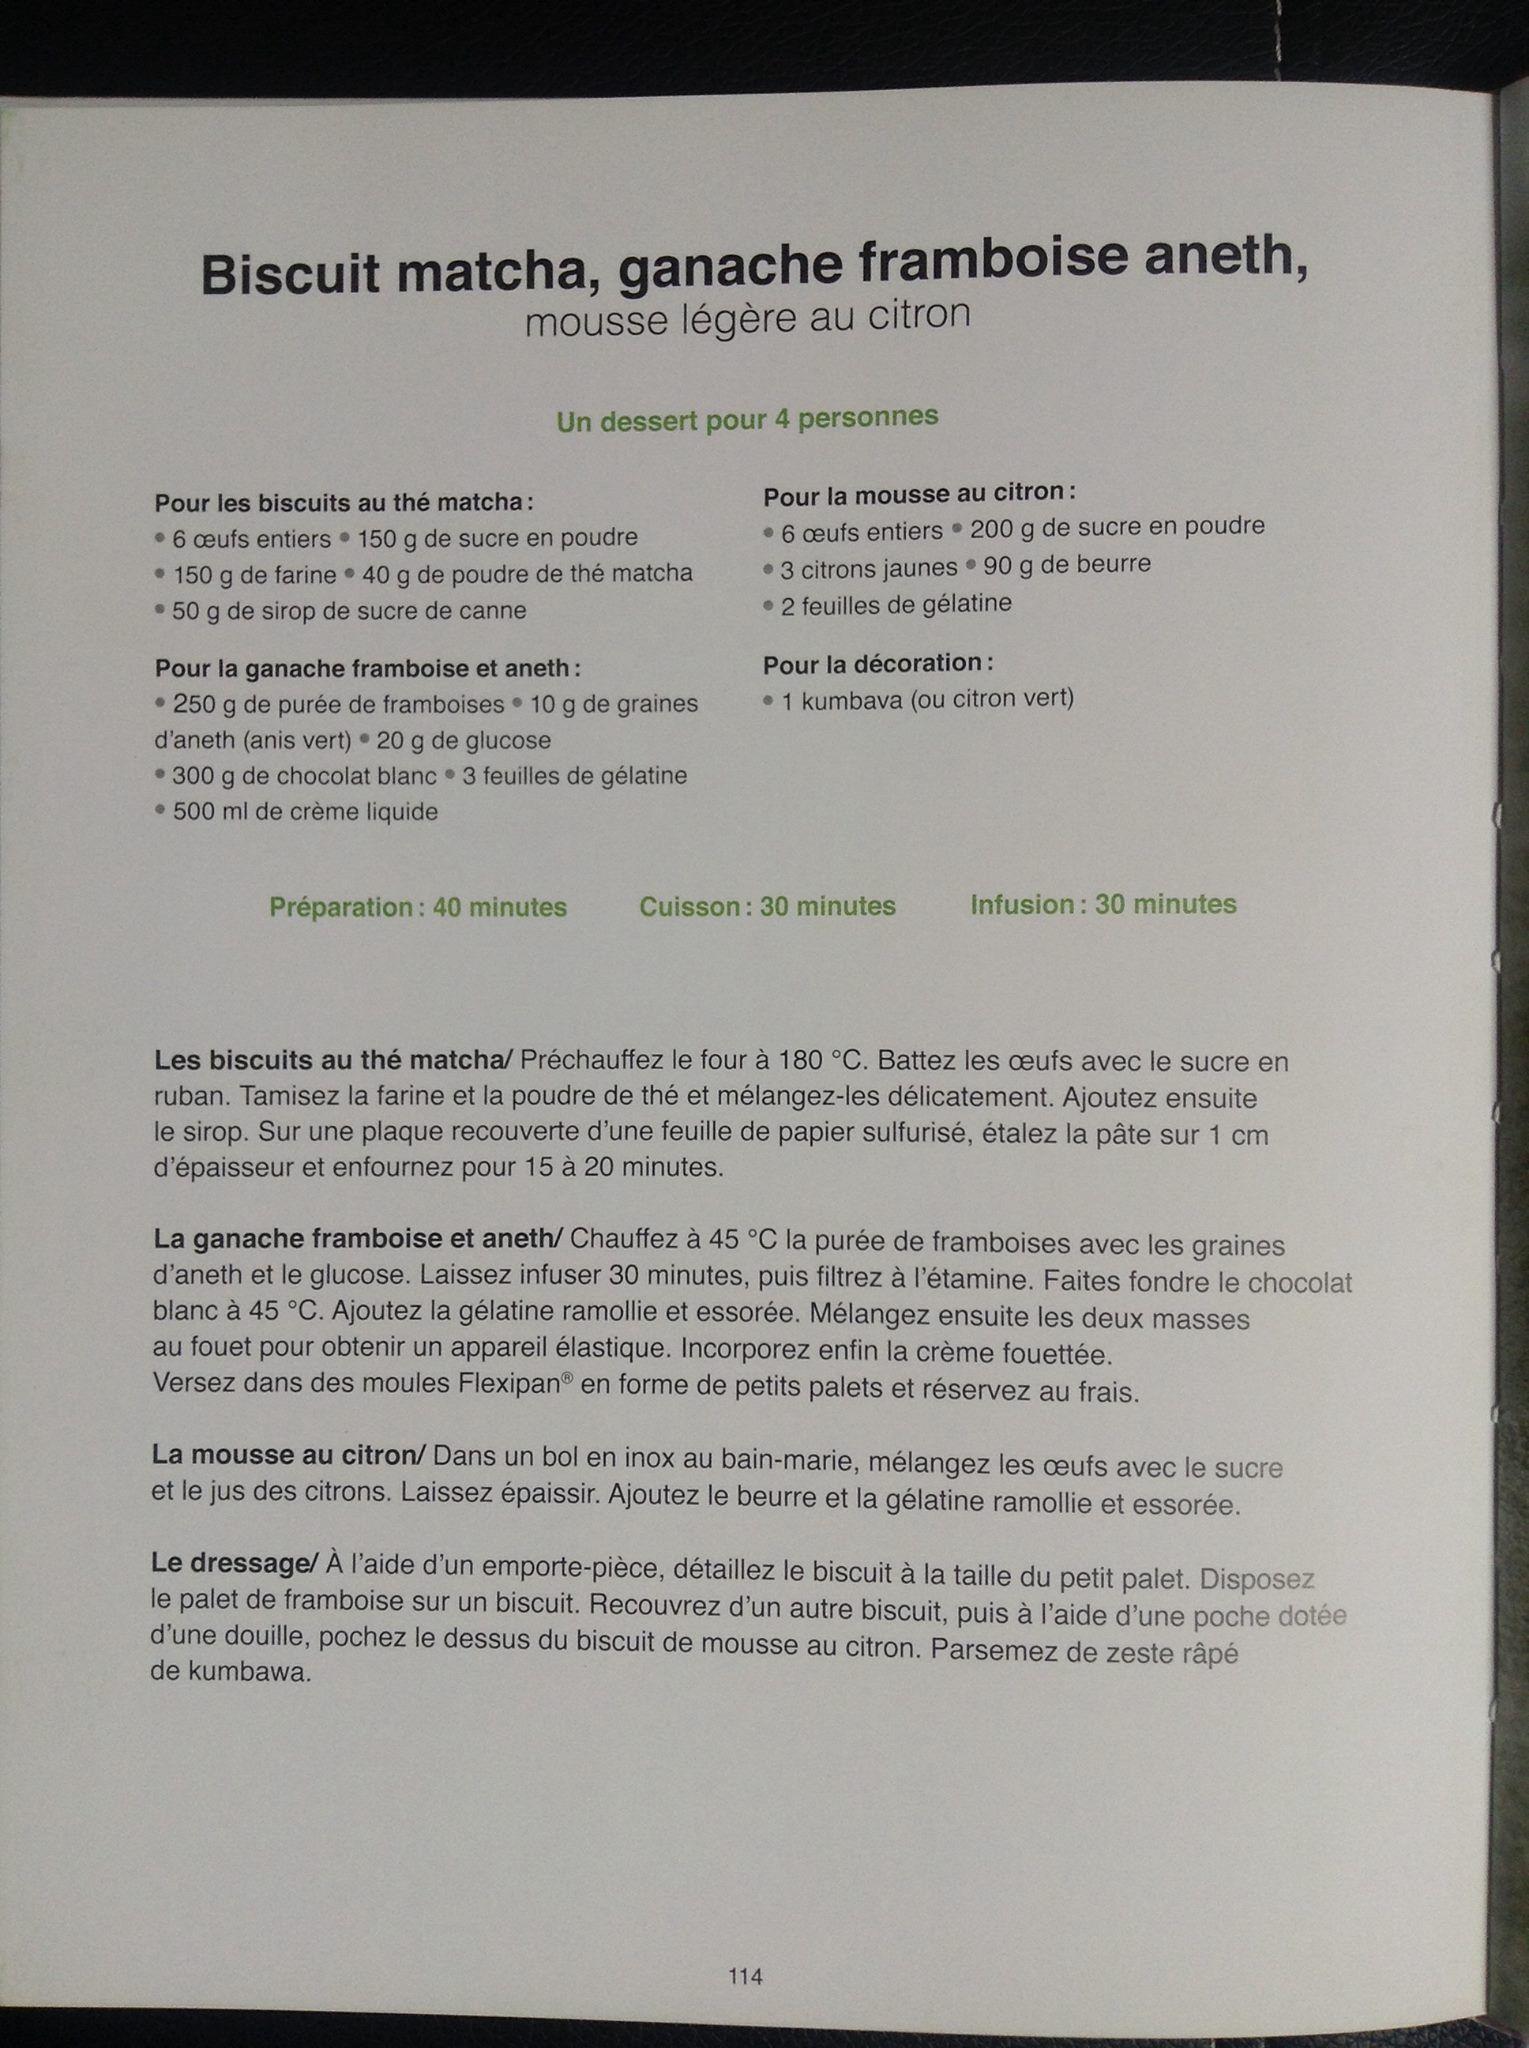 Biscuit Matcha, ganache framboise aneth. Recette de Norbert Tarayre